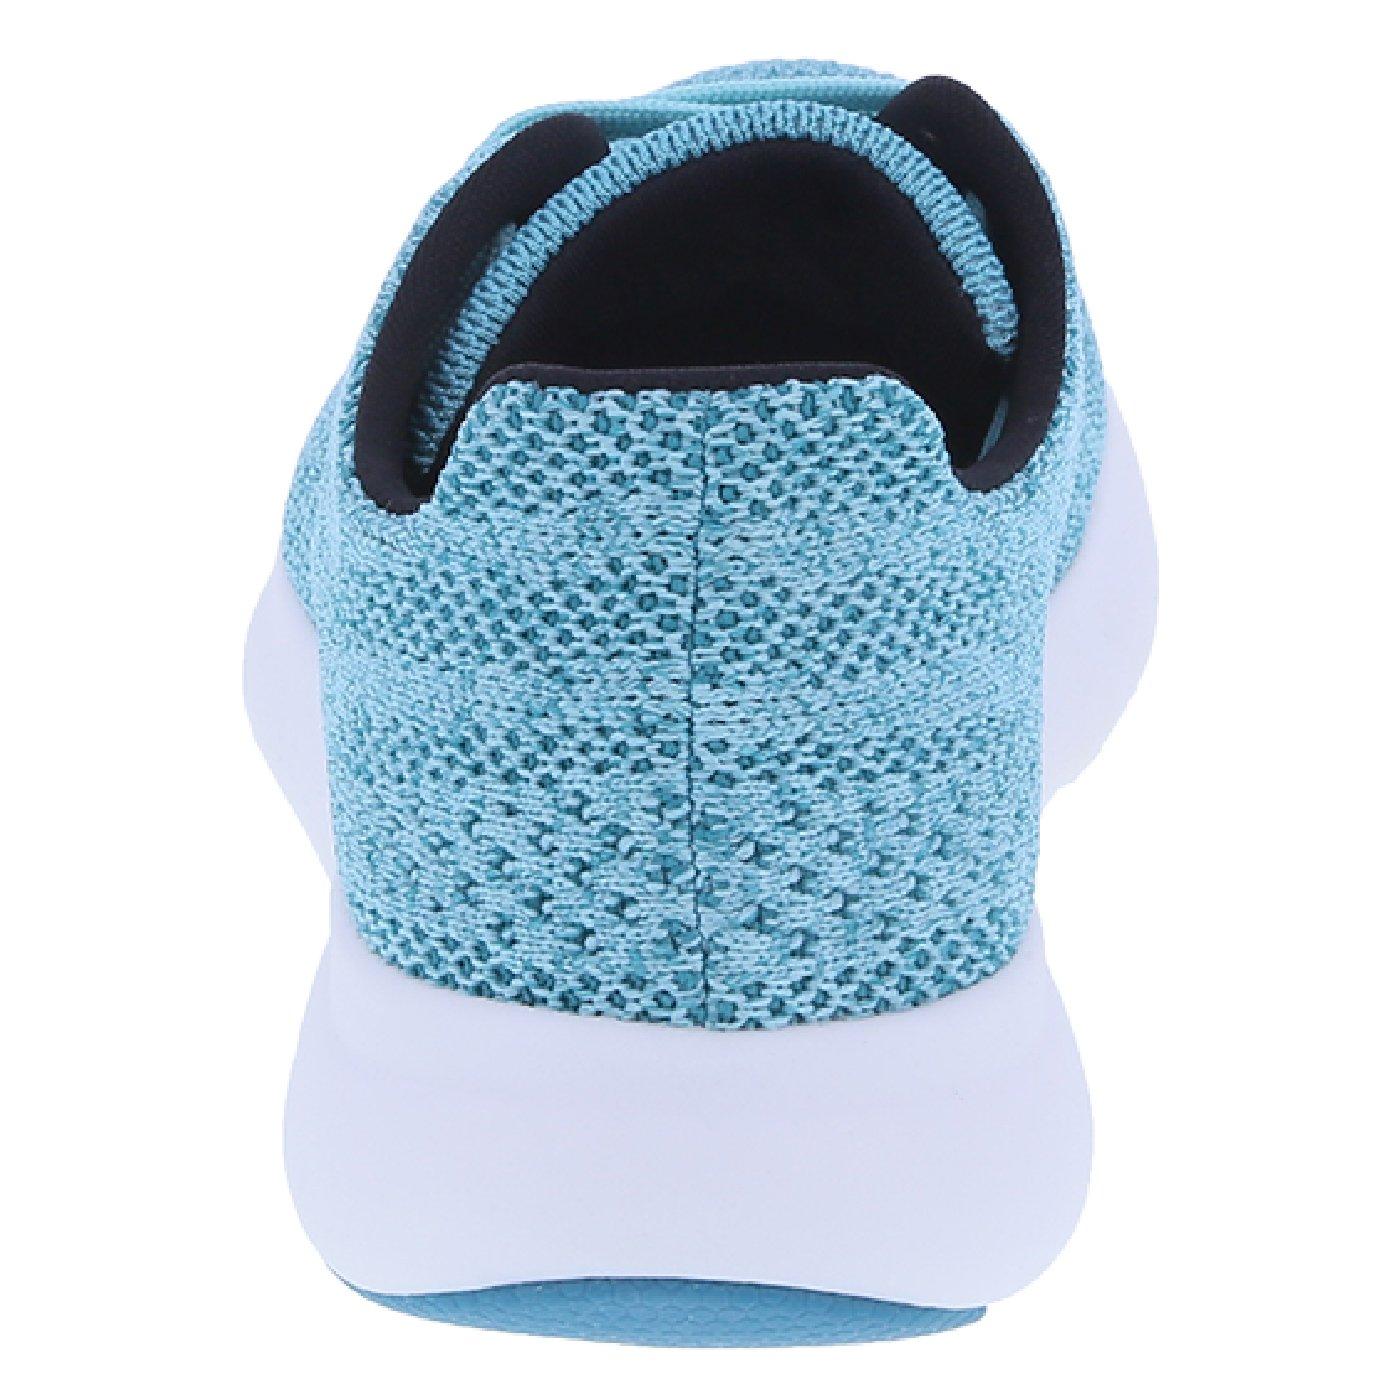 Champion Women's Activate Power Knit Runner B076D6FY9P 12 B(M) US|Mint